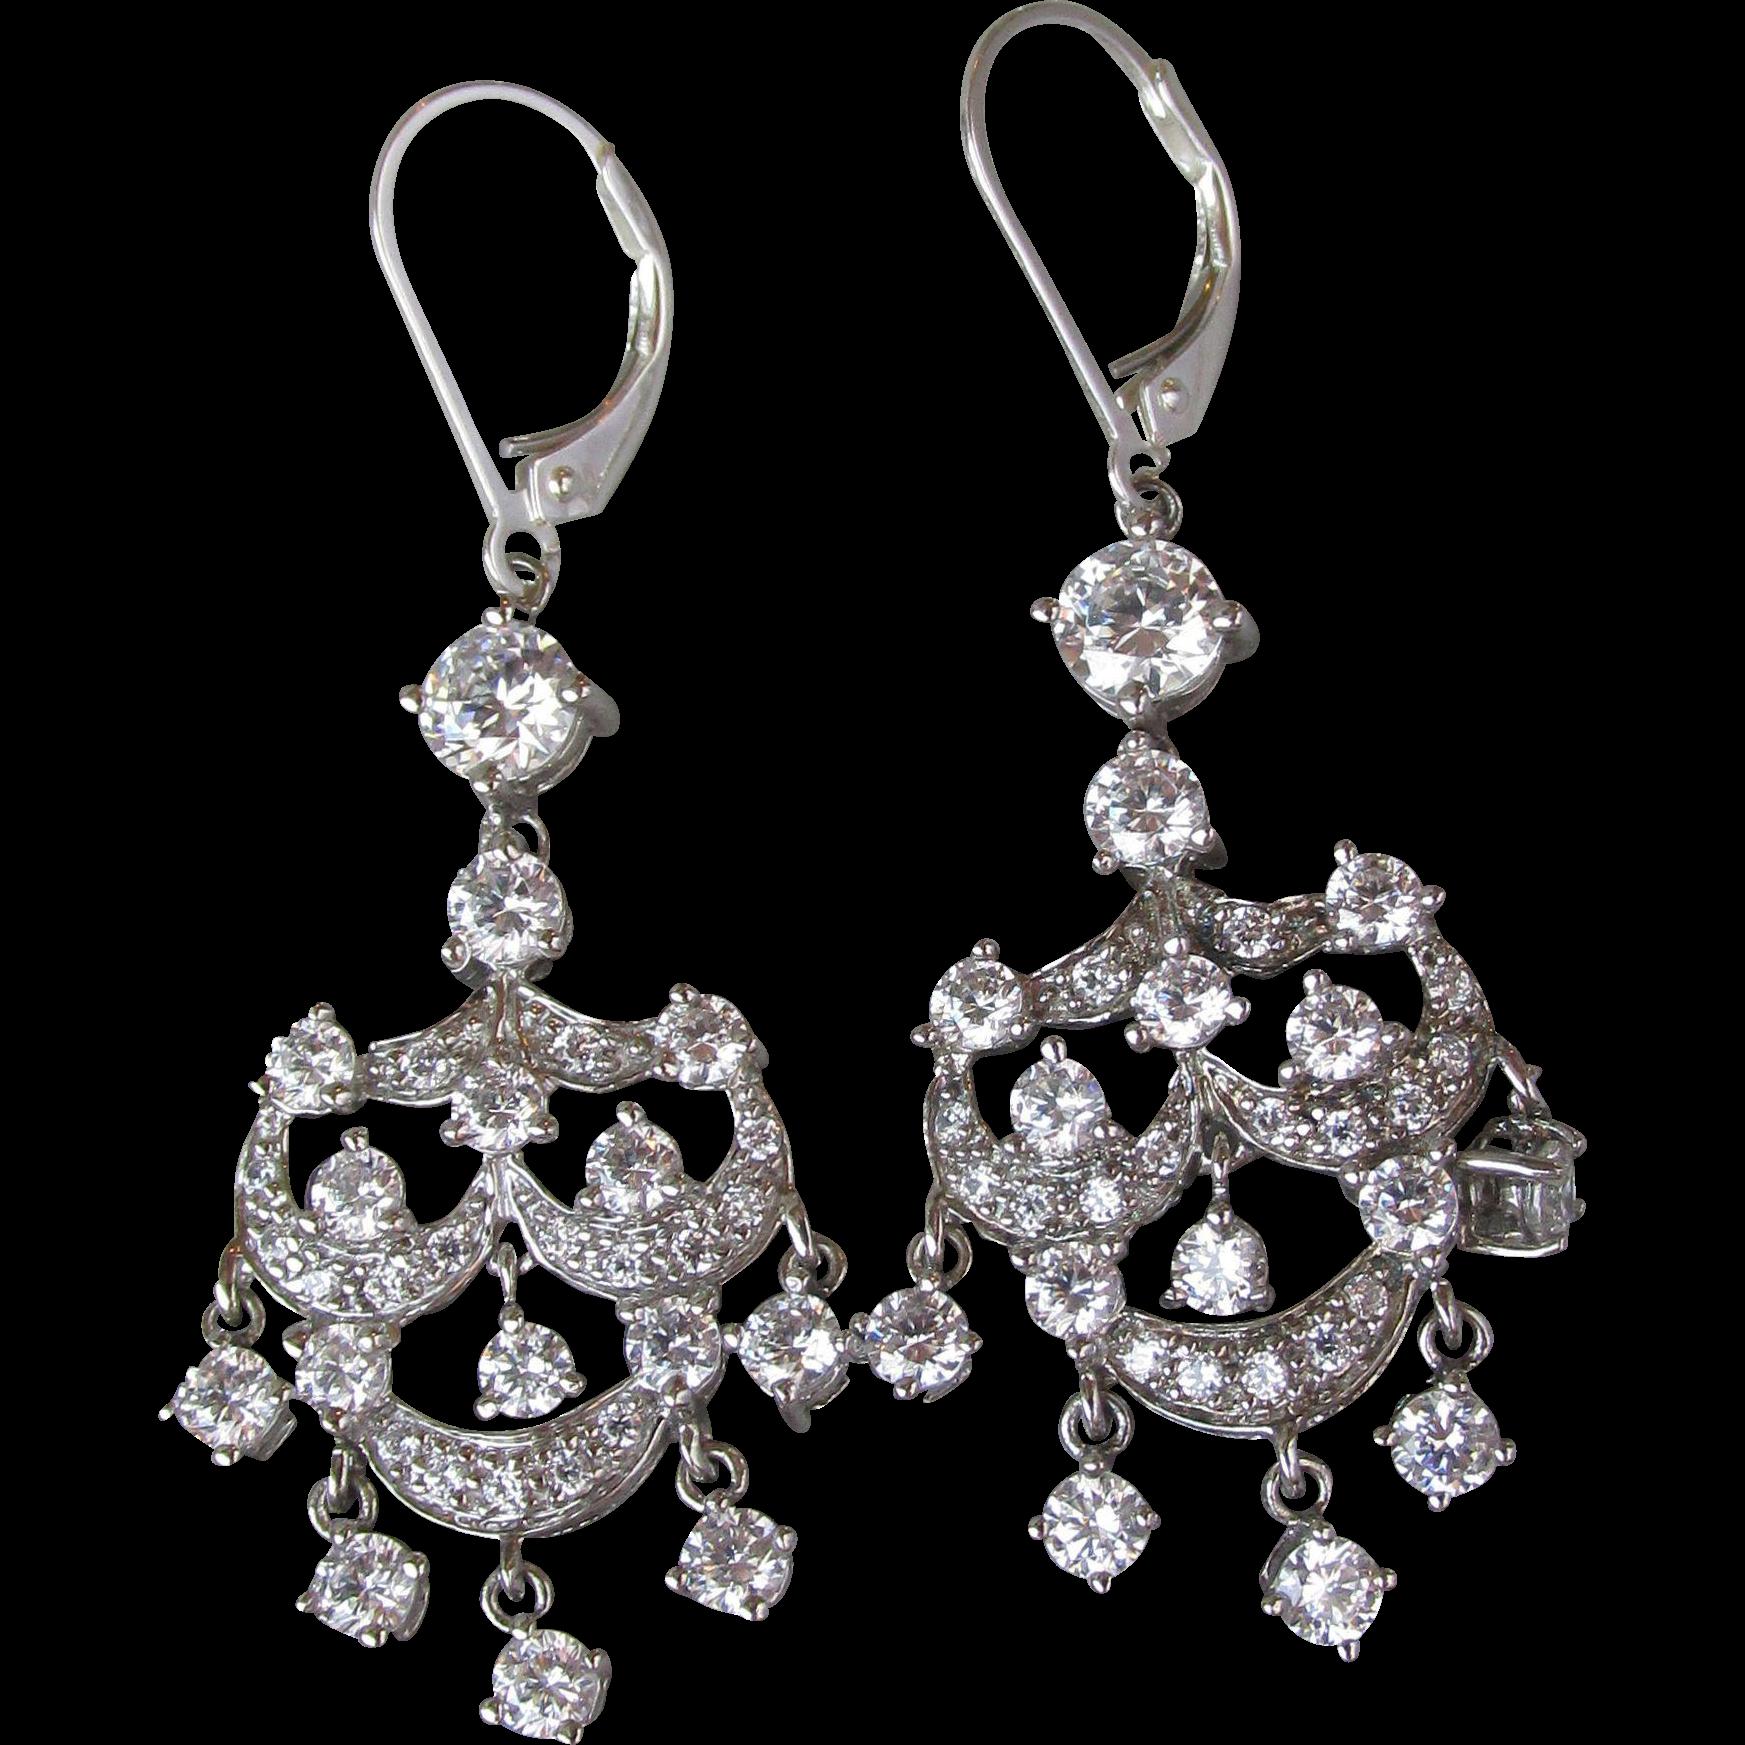 Elegant Sterling Silver Cubic Zirconia Vintage Chandelier Party Earrings